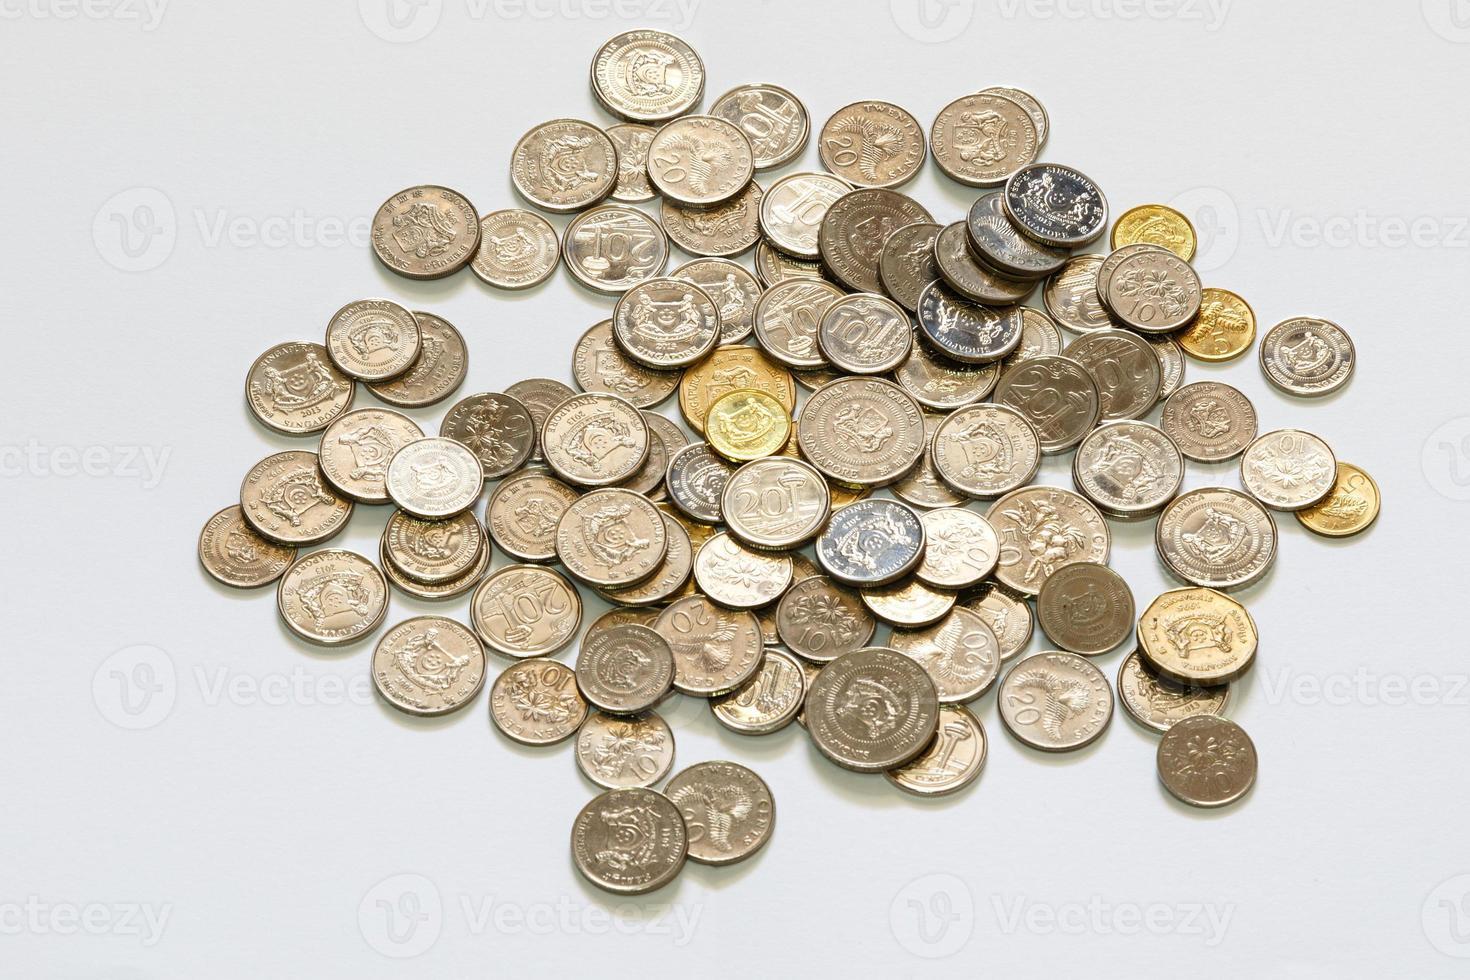 Singapur Münze foto